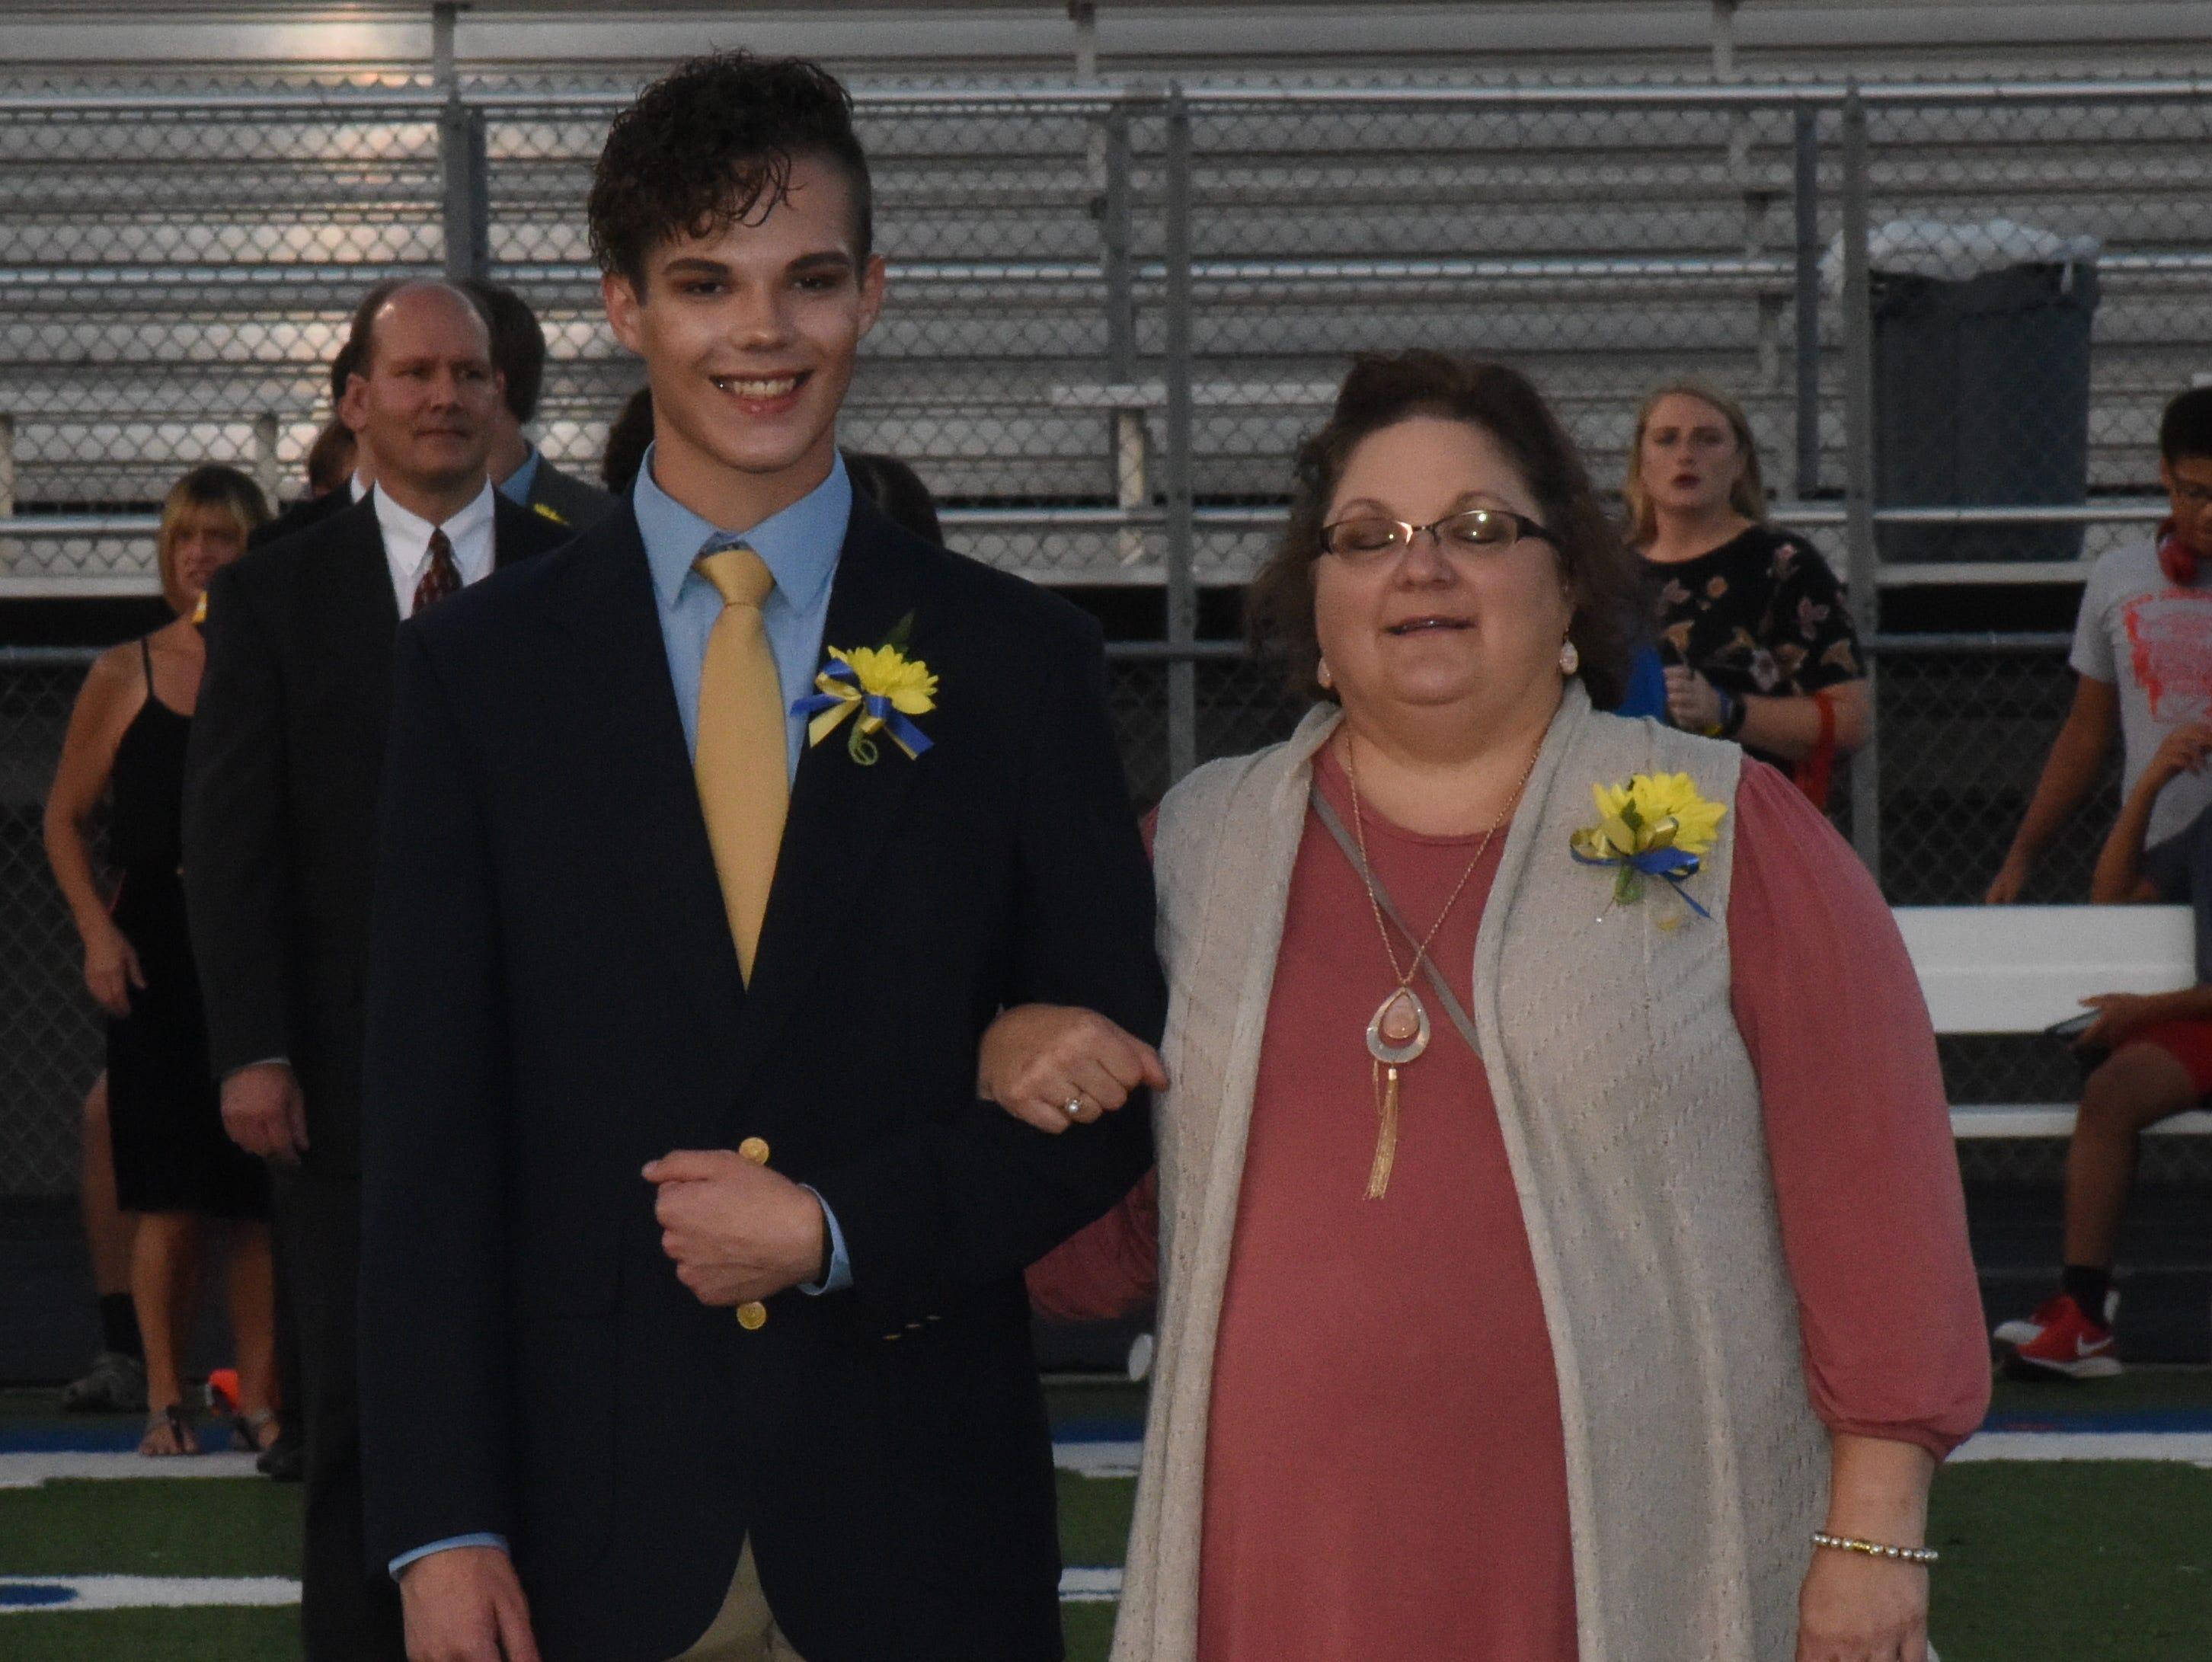 Junior knight Jesse Light and his mother, Pamela Light.